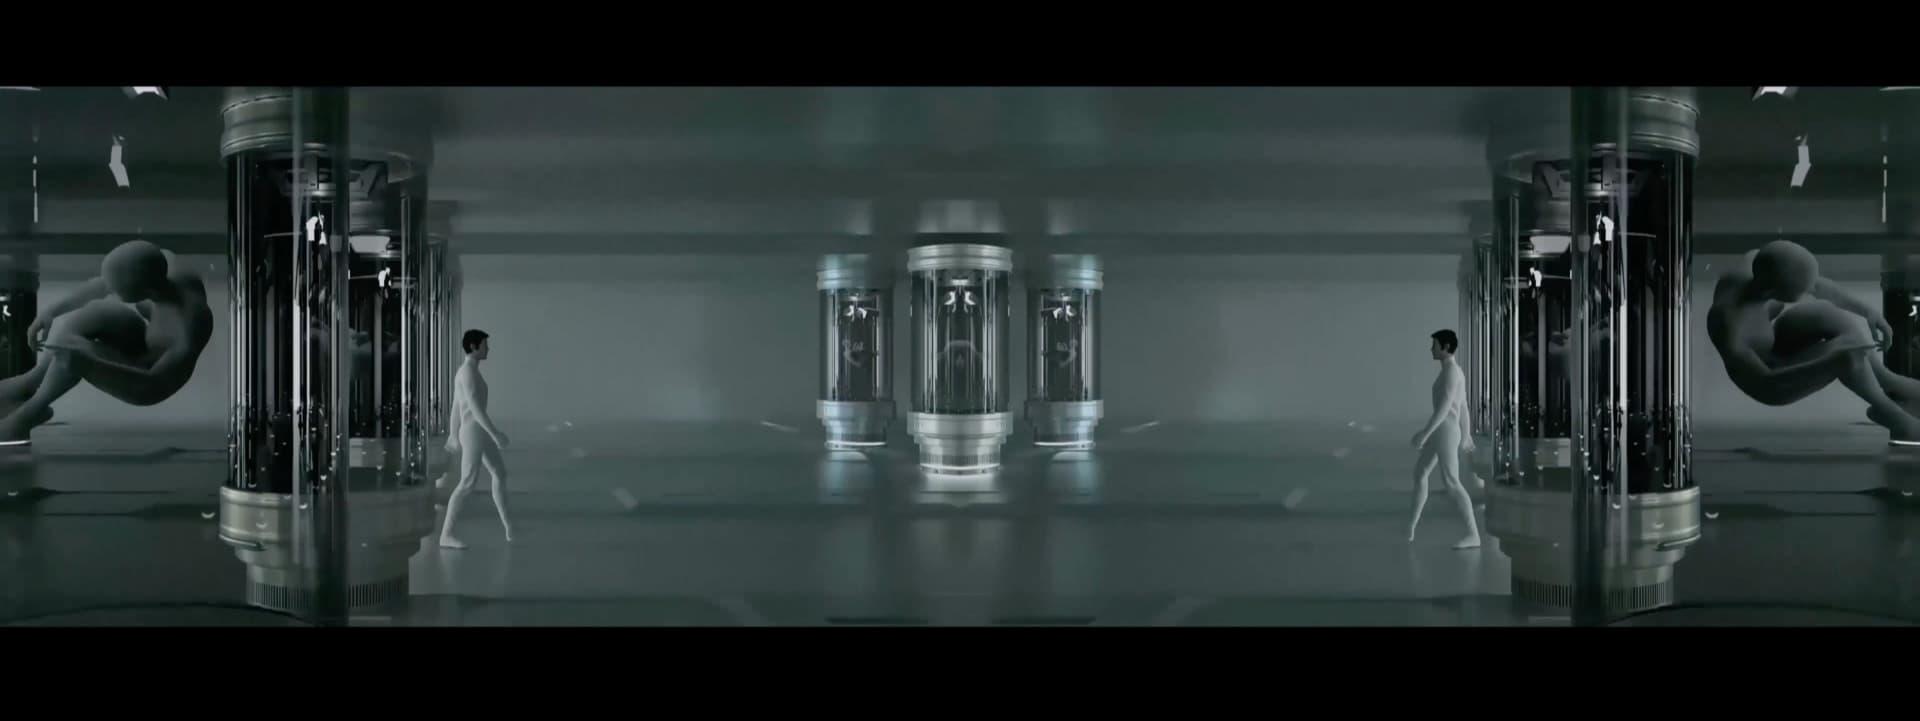 one-infinite3-film@2x